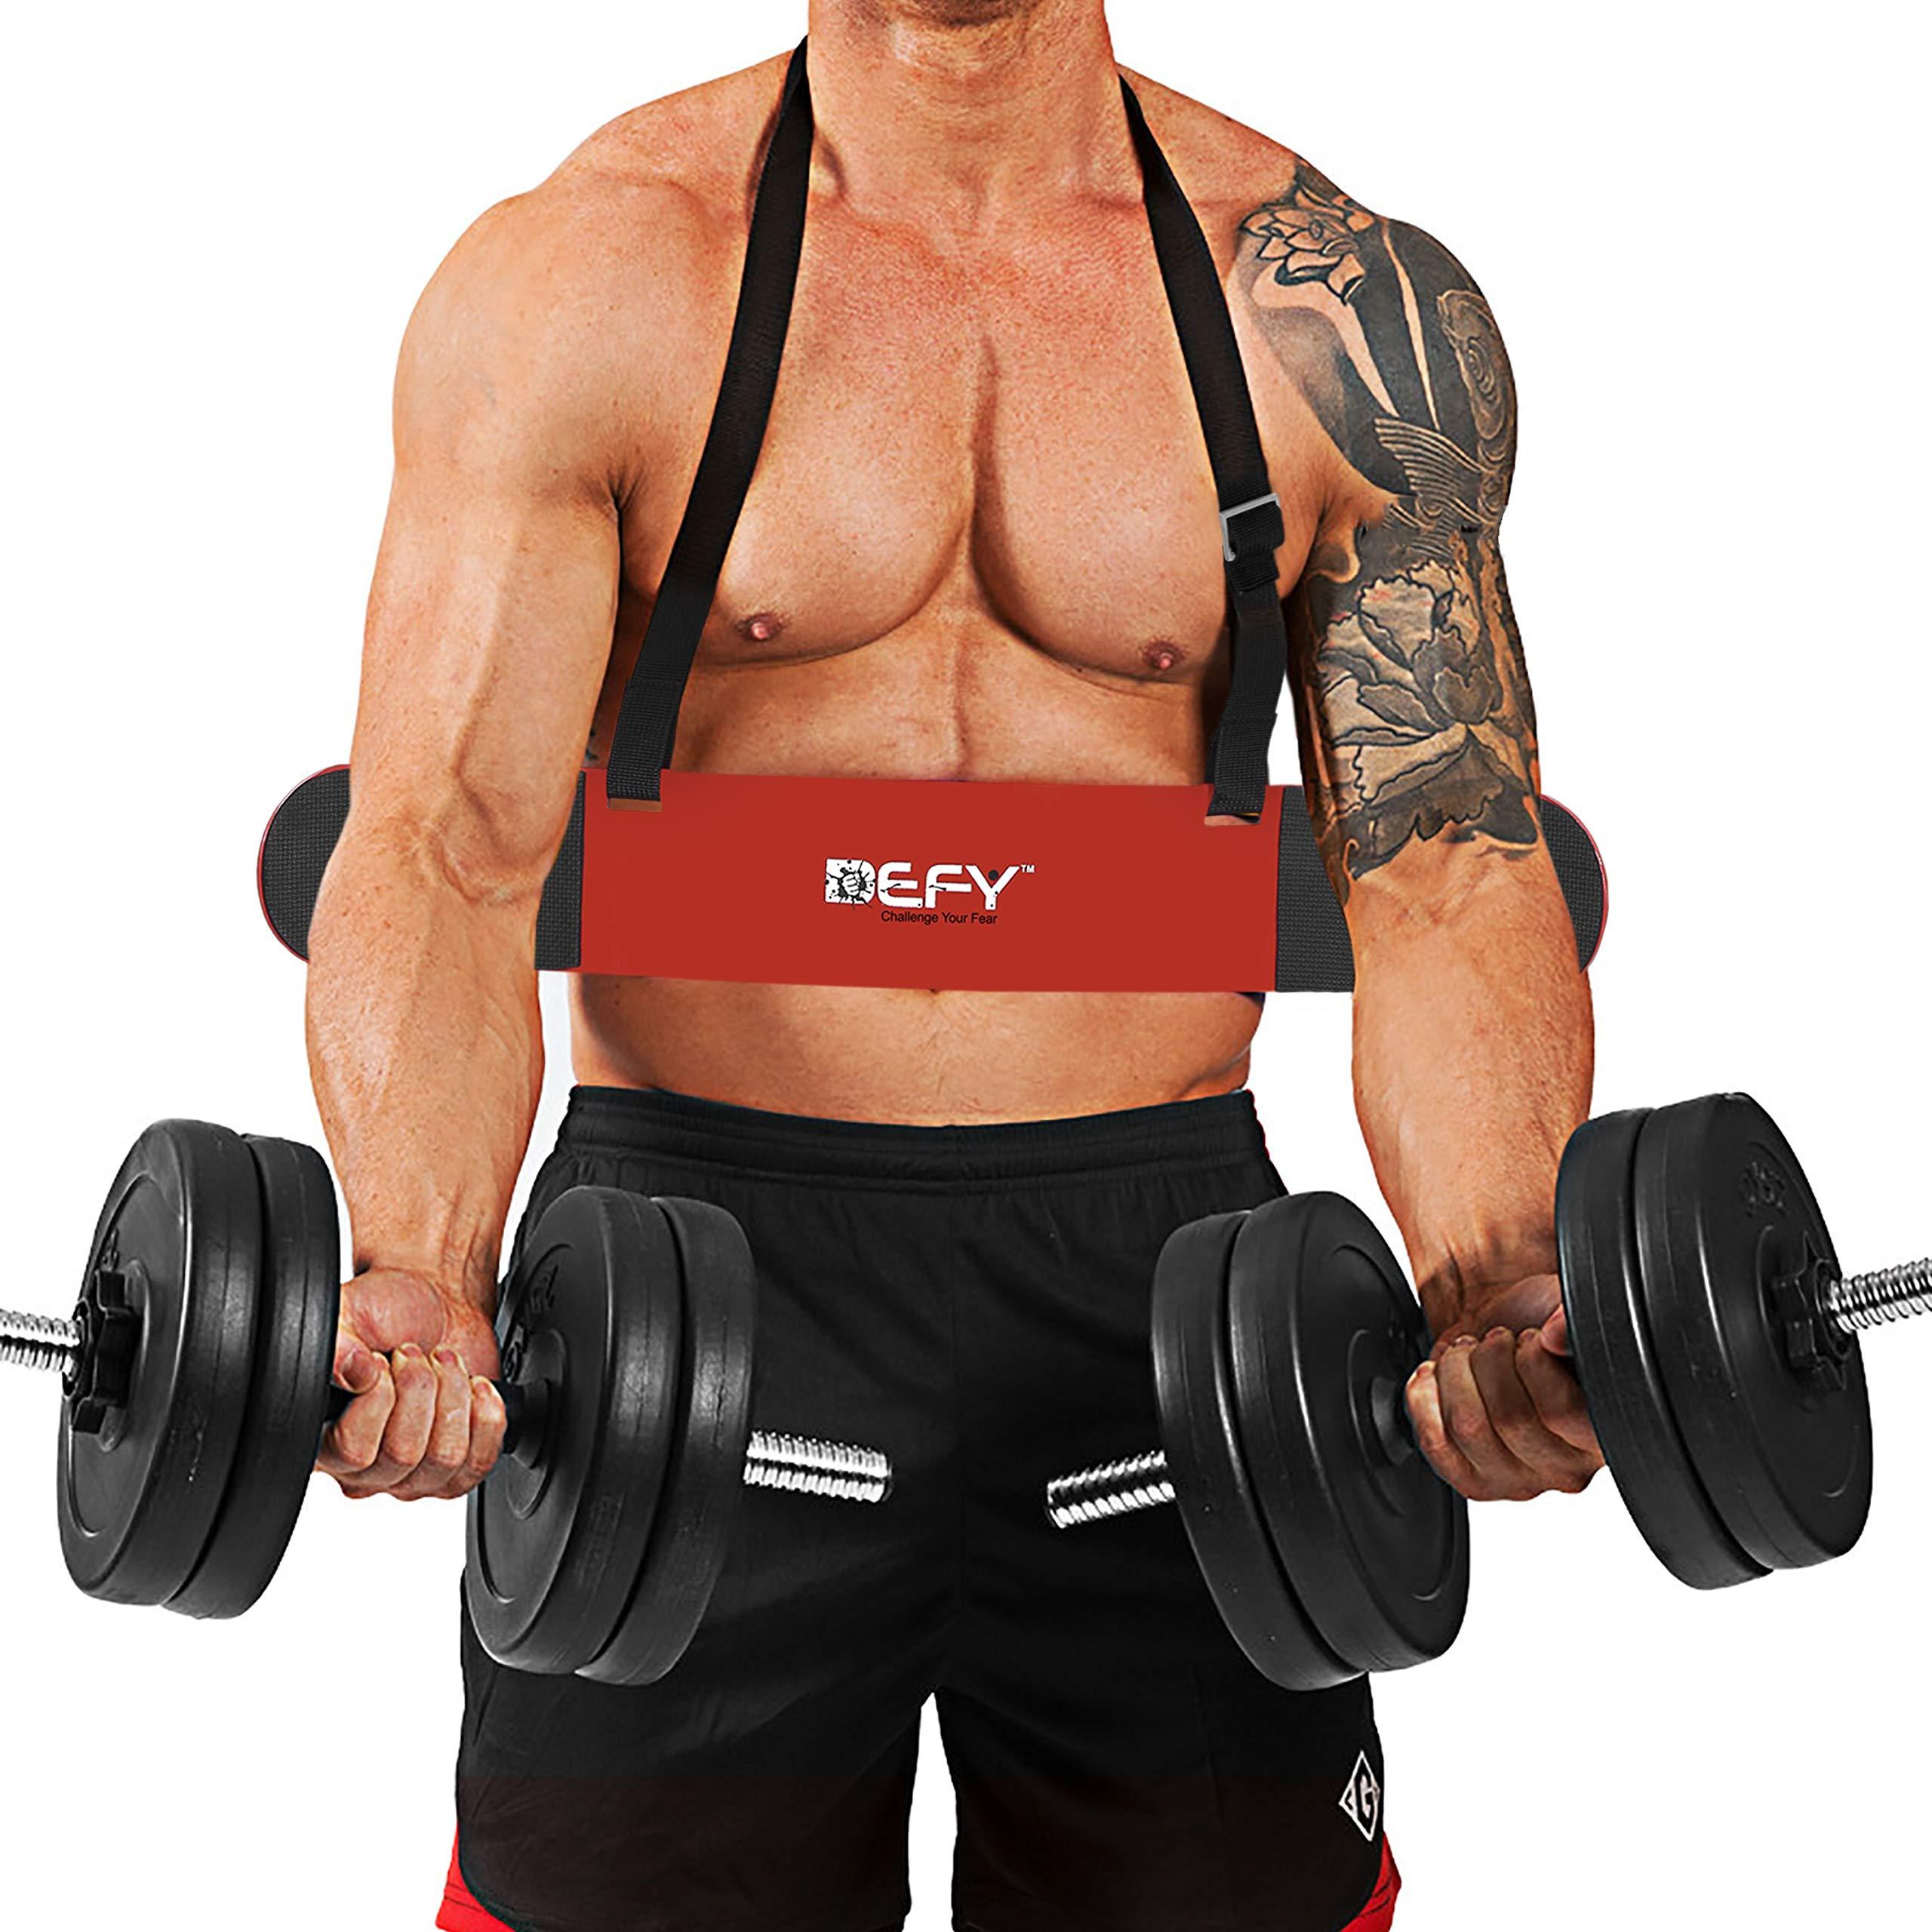 Support DEFY Aluminum Bodybuilders Advanced